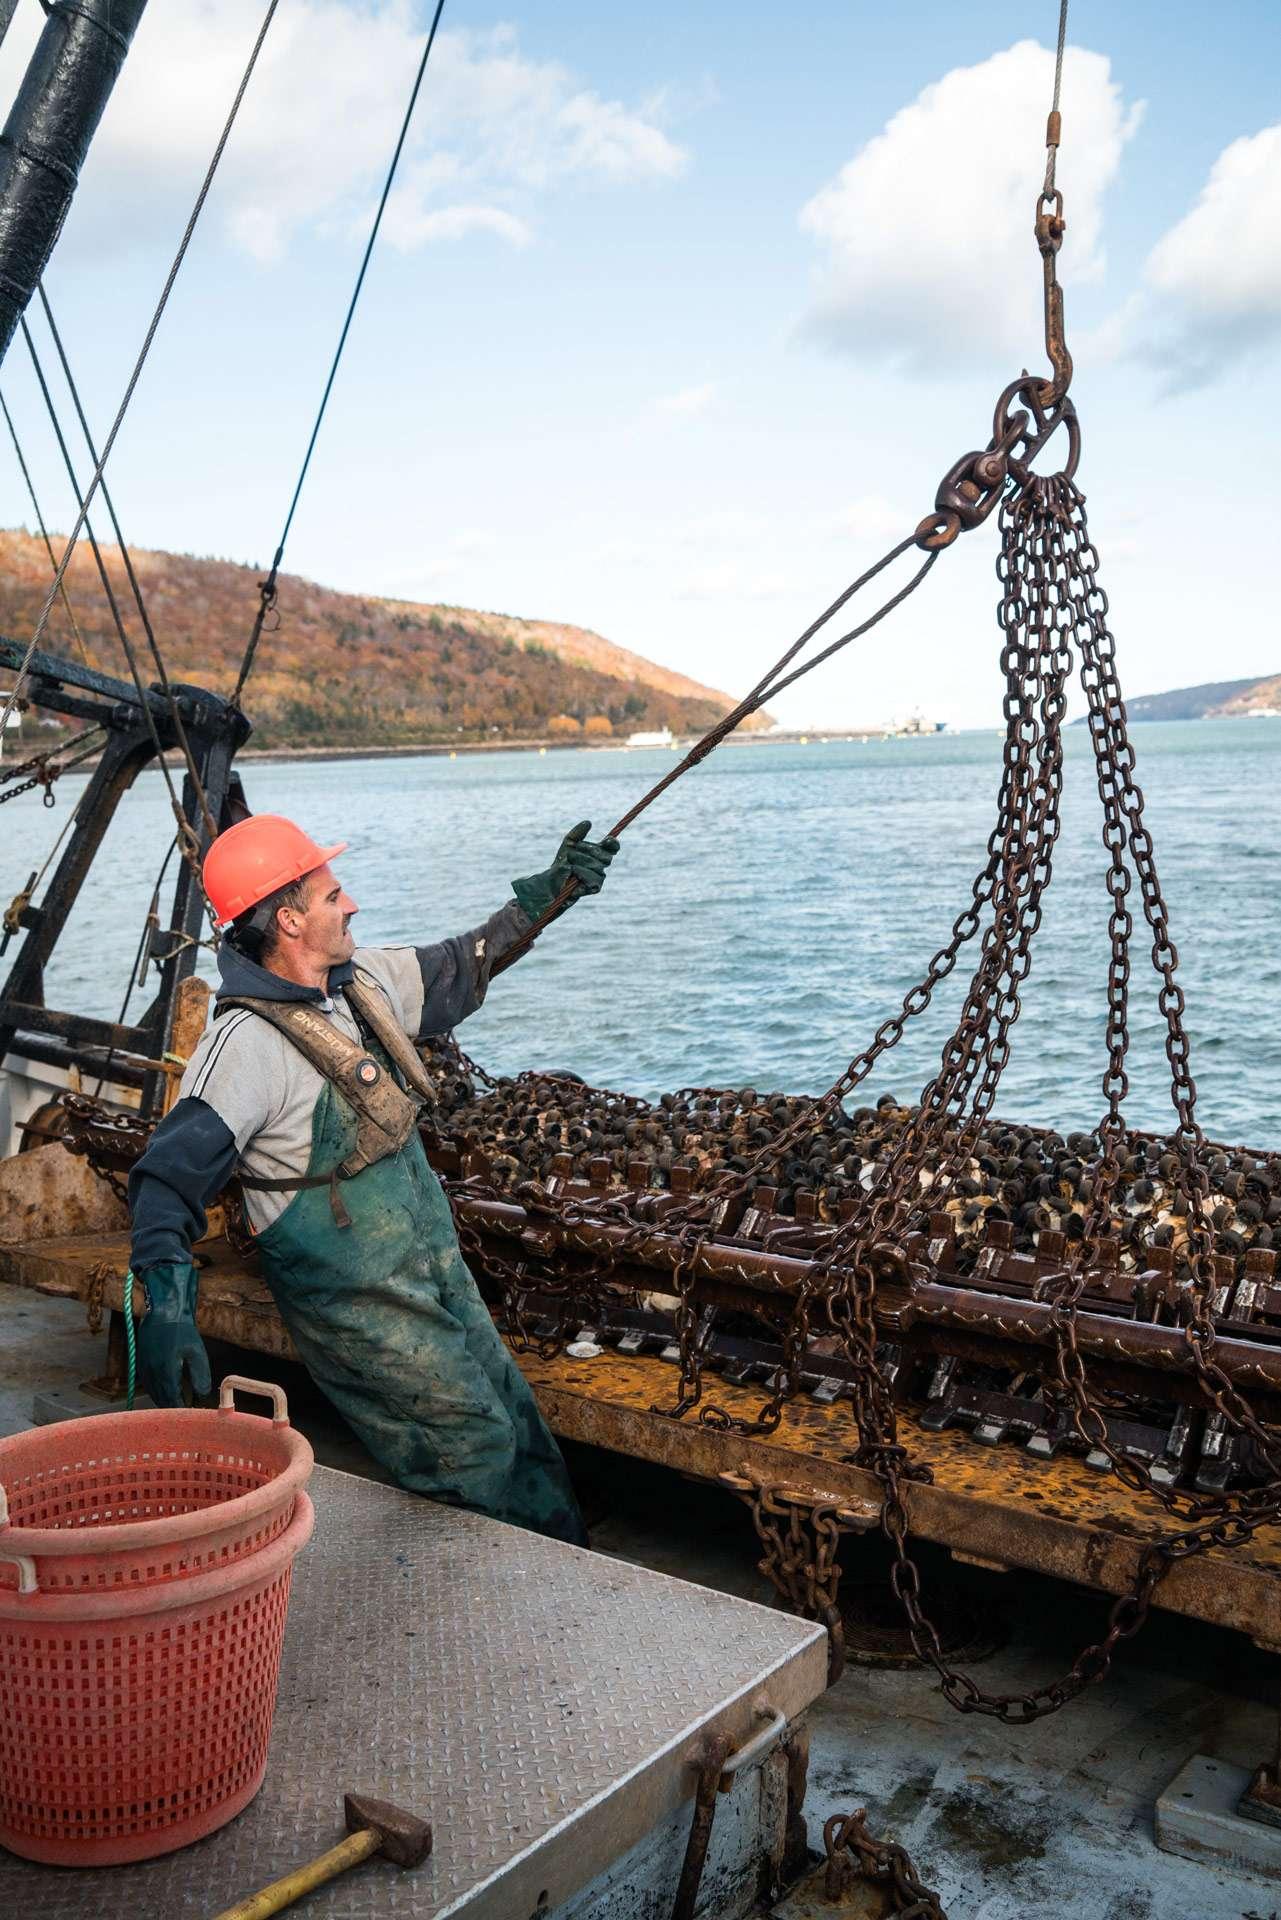 fisherman wearing red helmet stirring the fishing platform by Bruno Florin for Ricardo Magazine in Bay of Fundy